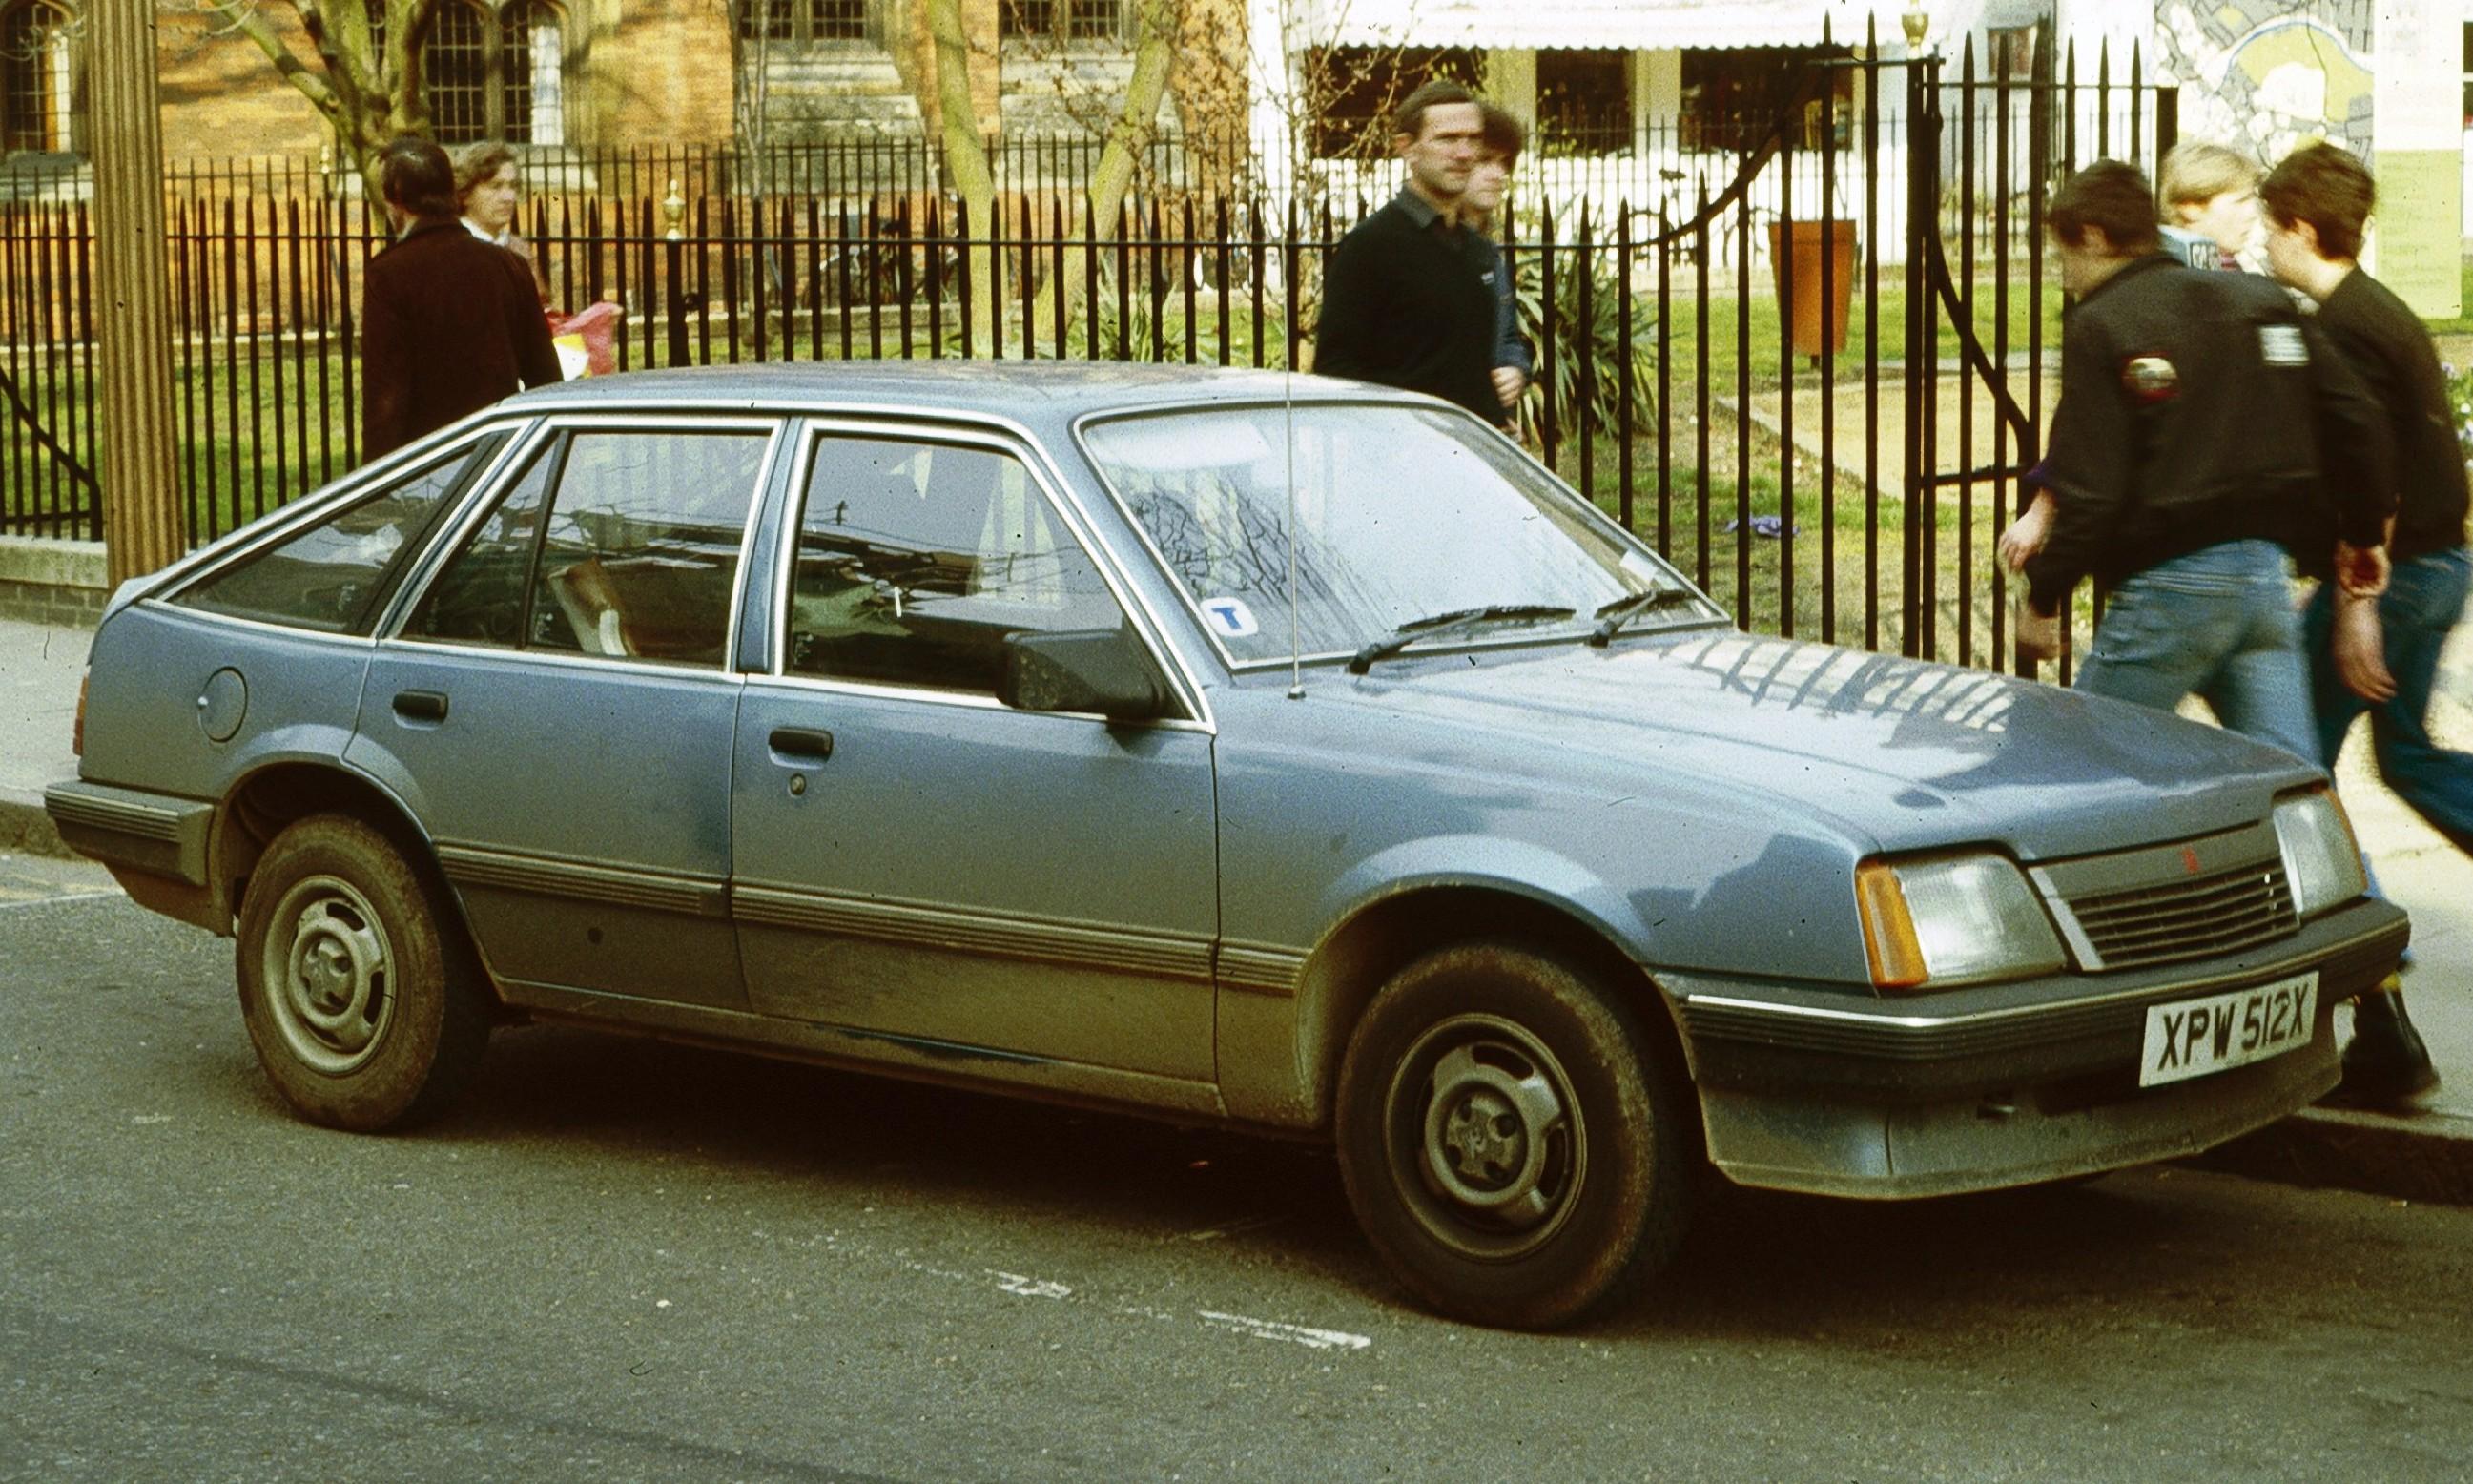 vauxhall wallpaper (Vauxhall Cavalier)